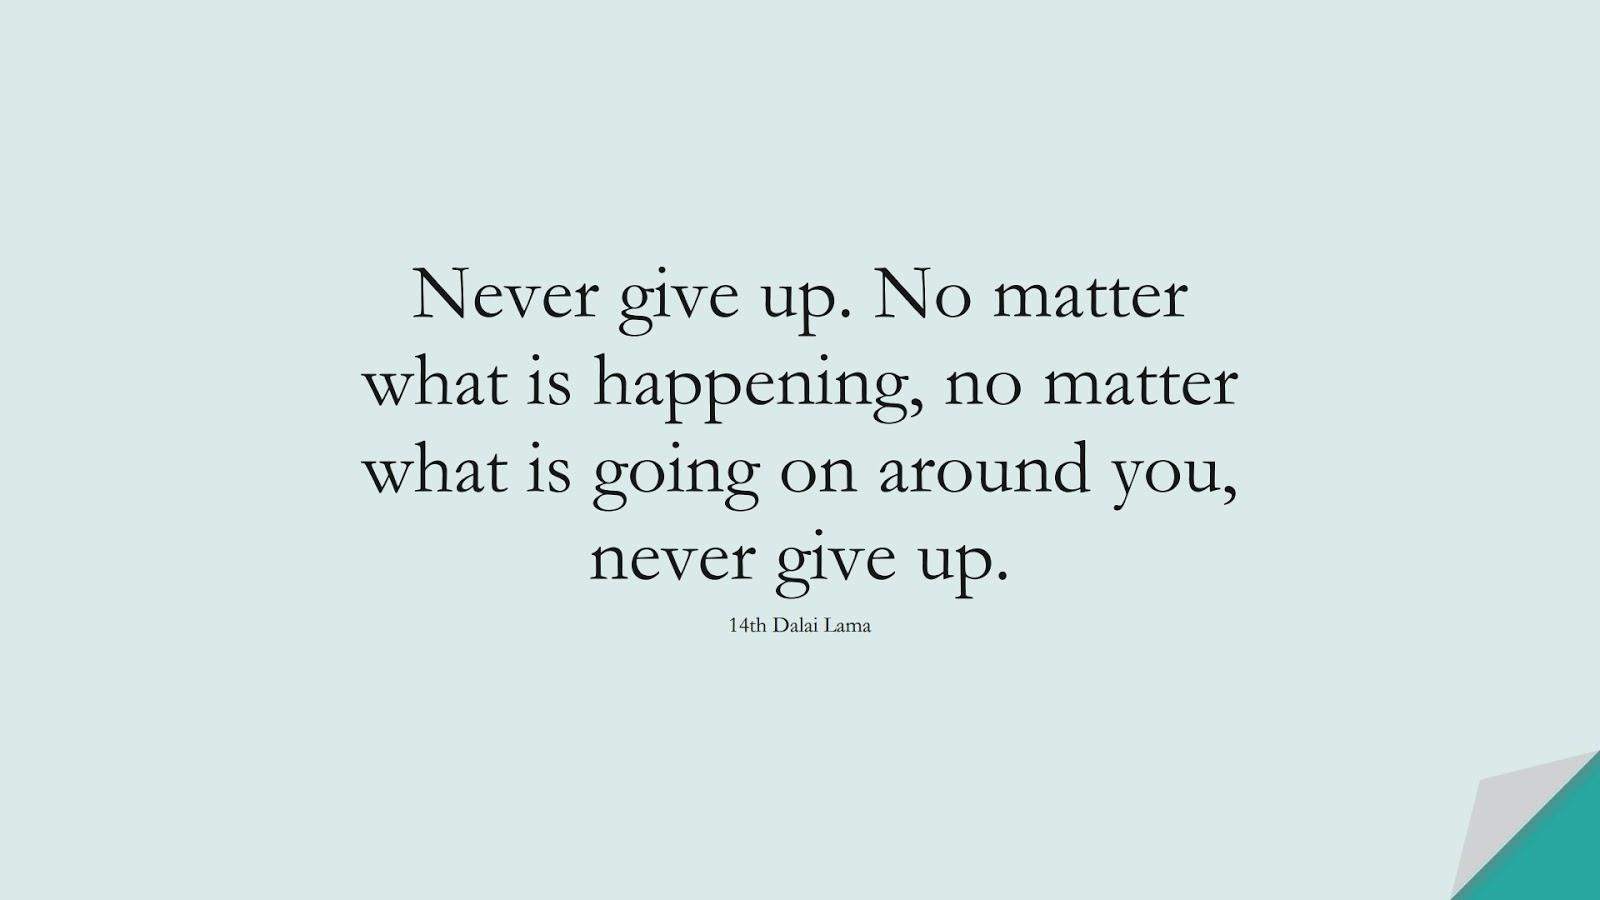 Never give up. No matter what is happening, no matter what is going on around you, never give up. (14th Dalai Lama);  #NeverGiveUpQuotes